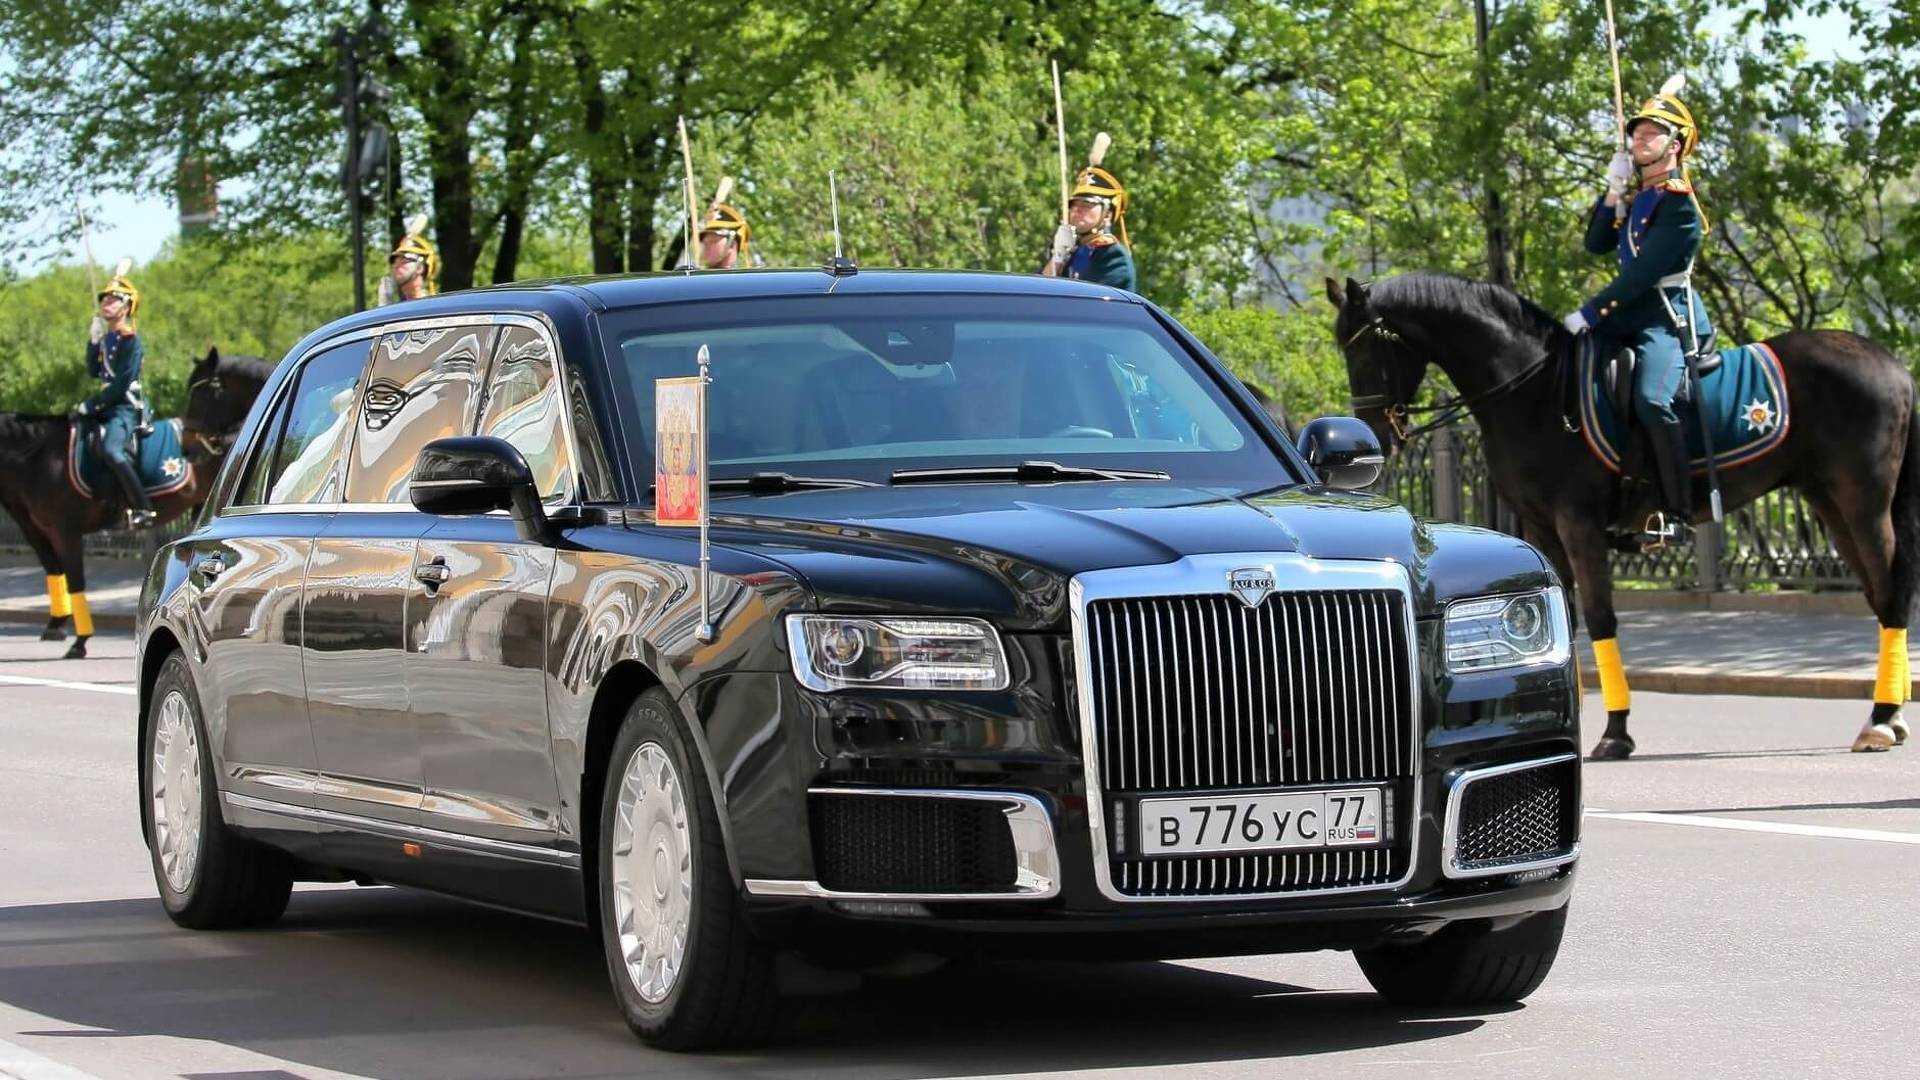 Limousine Vladimir Putin in 2018 48